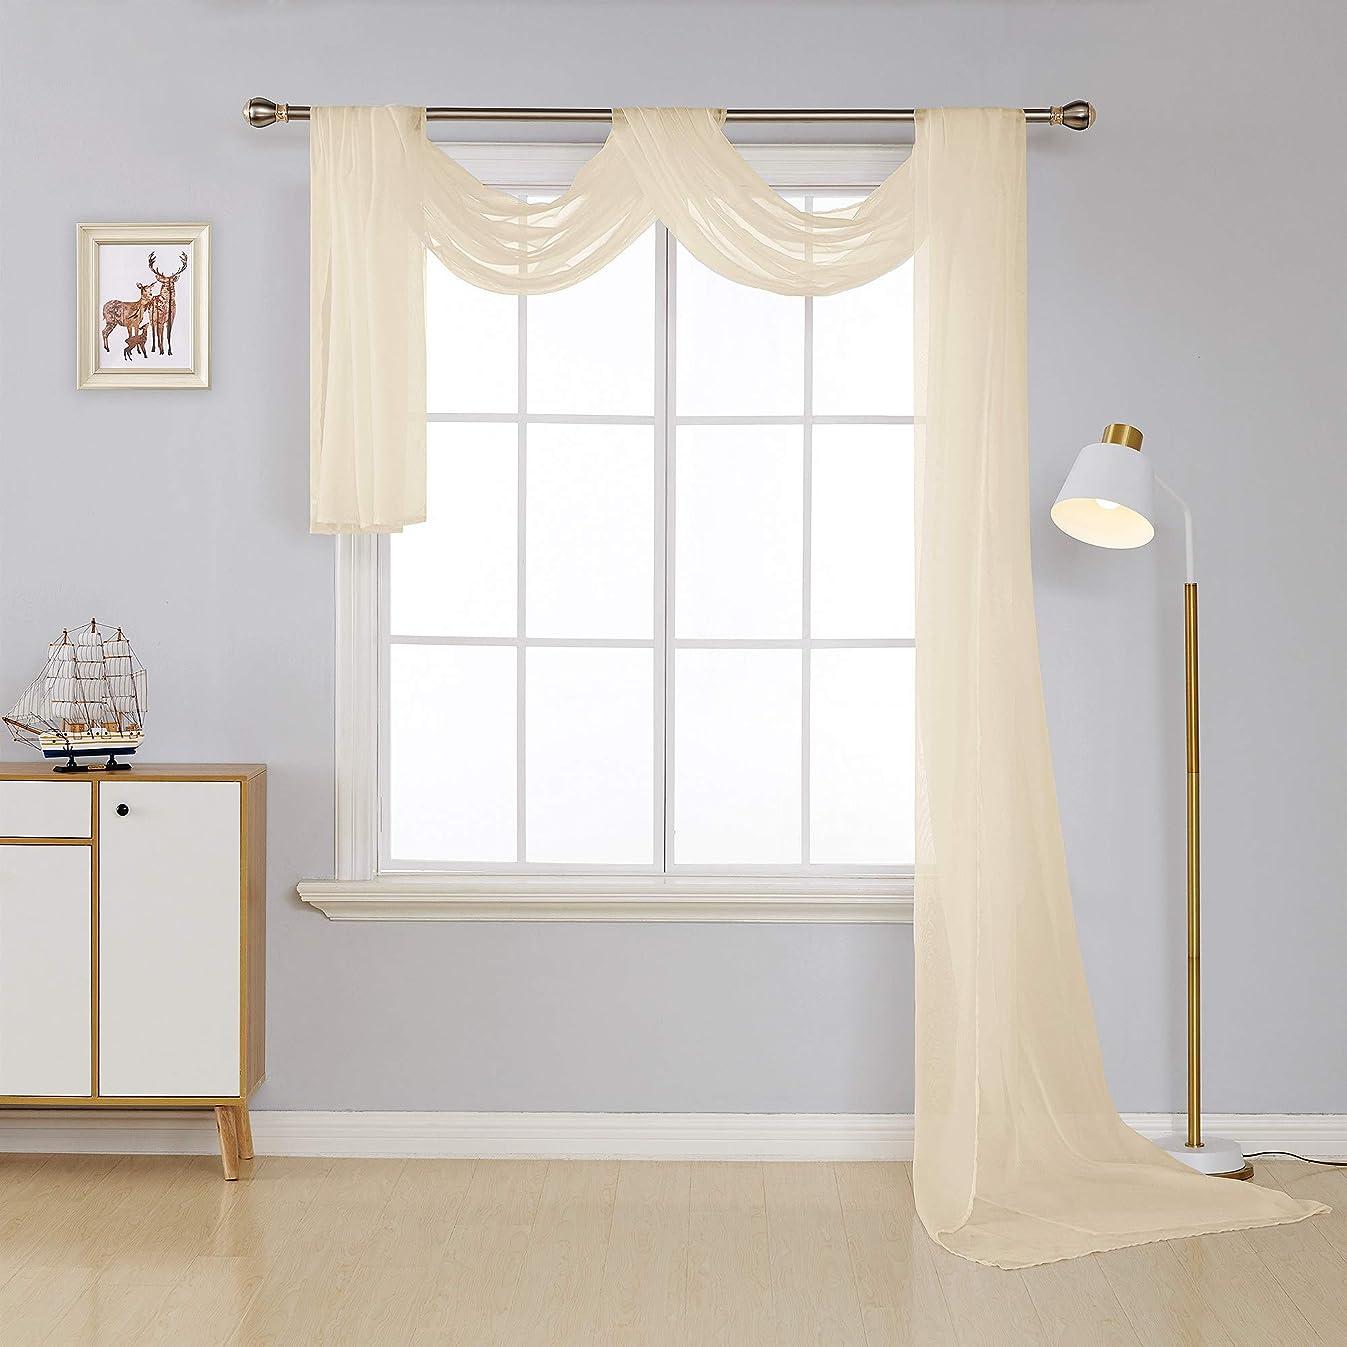 Deconovo Elengace Window Sheer Voile Scarf Valance Panel for Wedding Beige 54W x 216L Inch One Panel